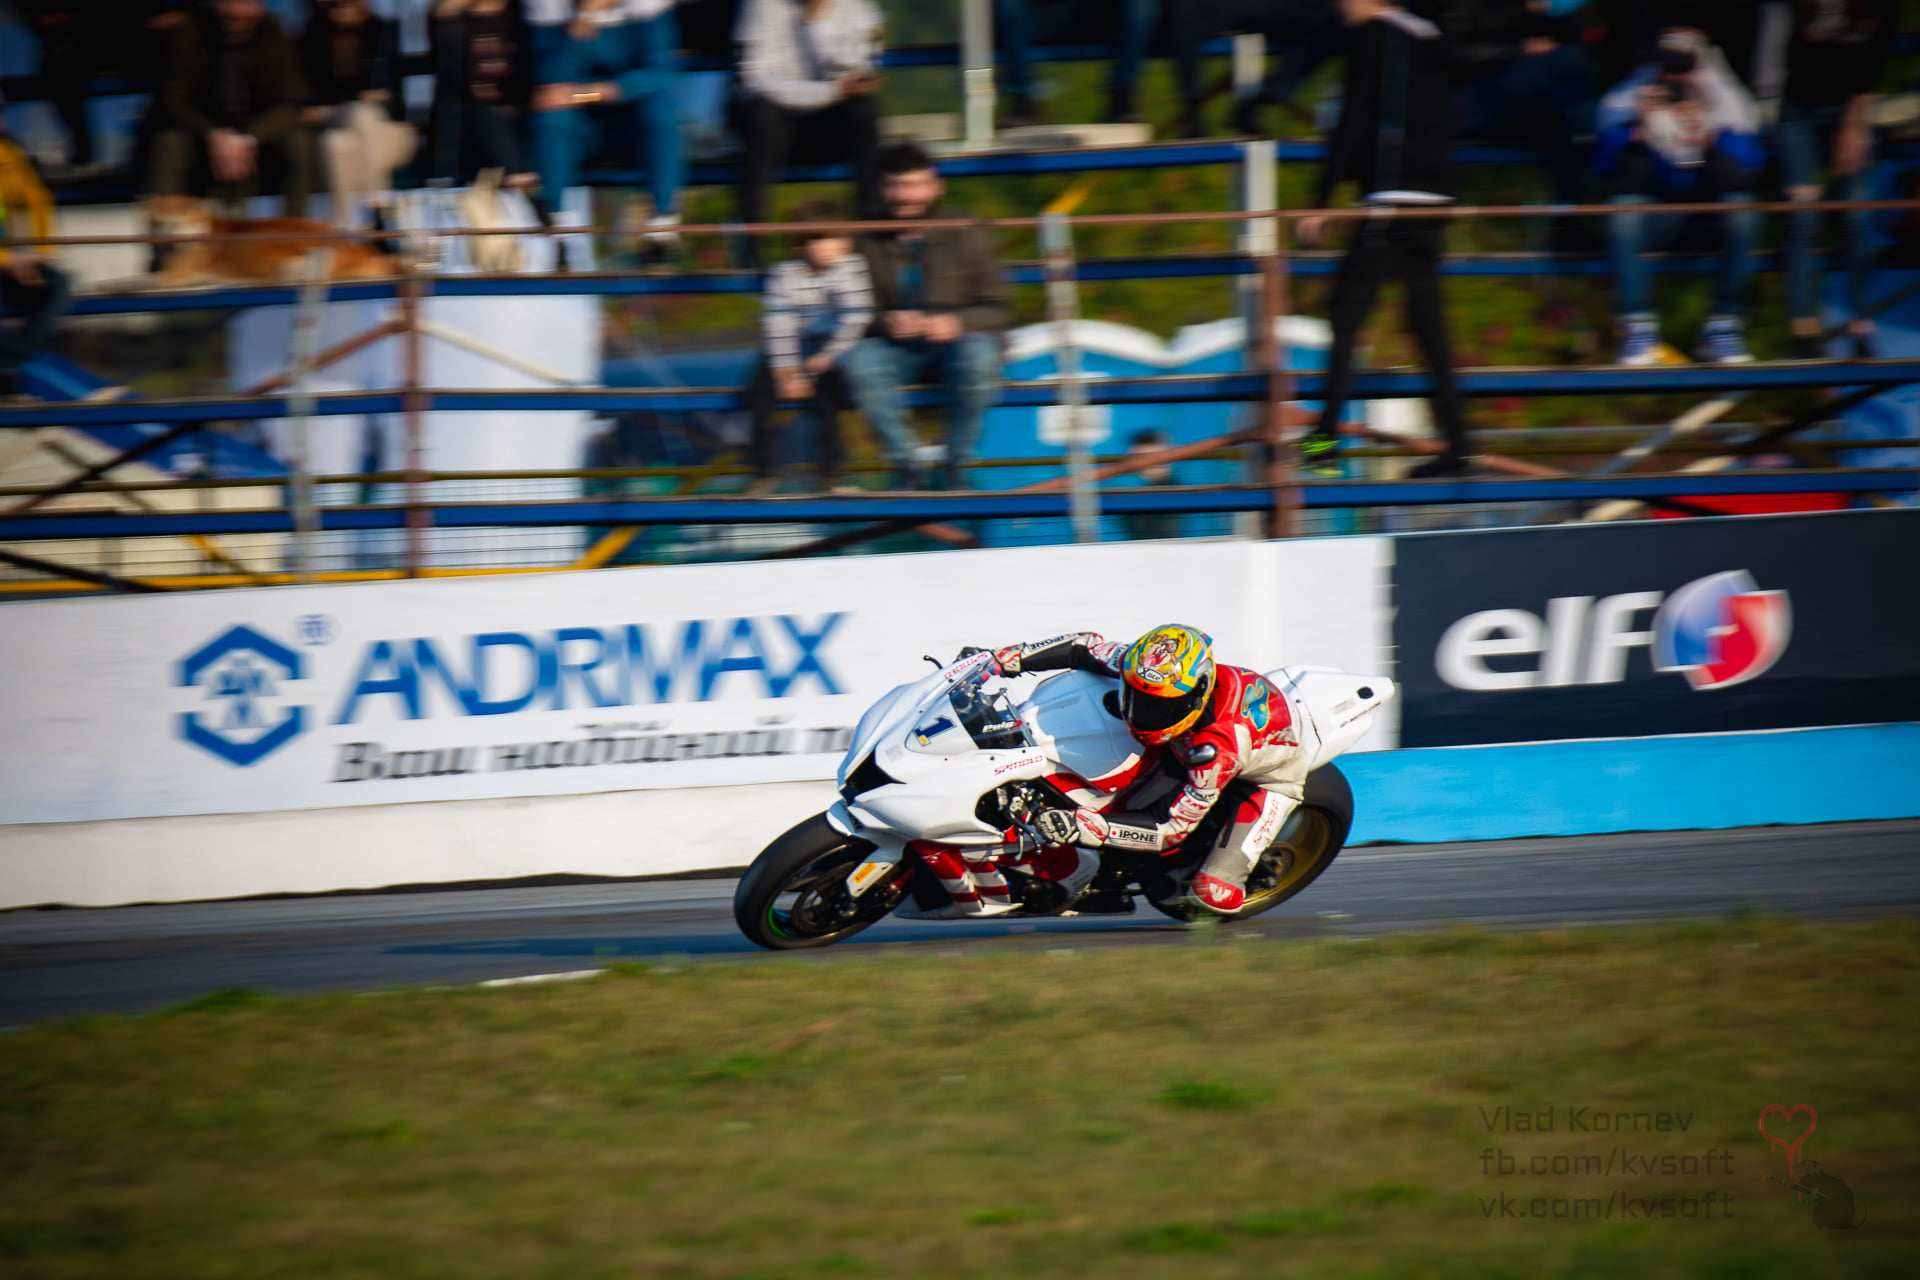 5-6_etap_MotoGPUkraine_023